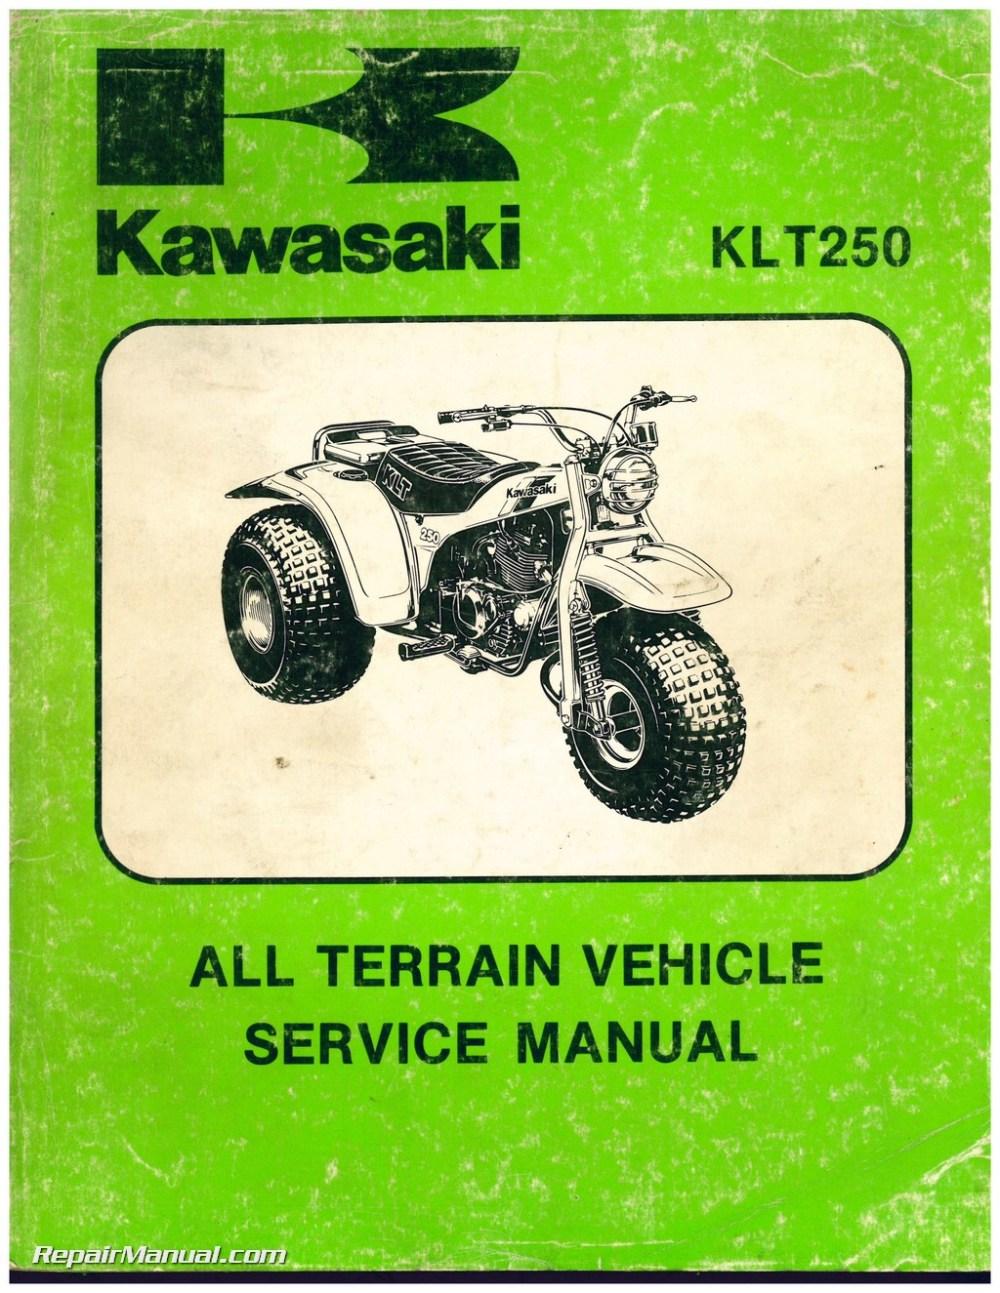 medium resolution of 1982 kawasaki klt250 a1 3 wheel atc printed service manual rh repairmanual com wiring diagram for